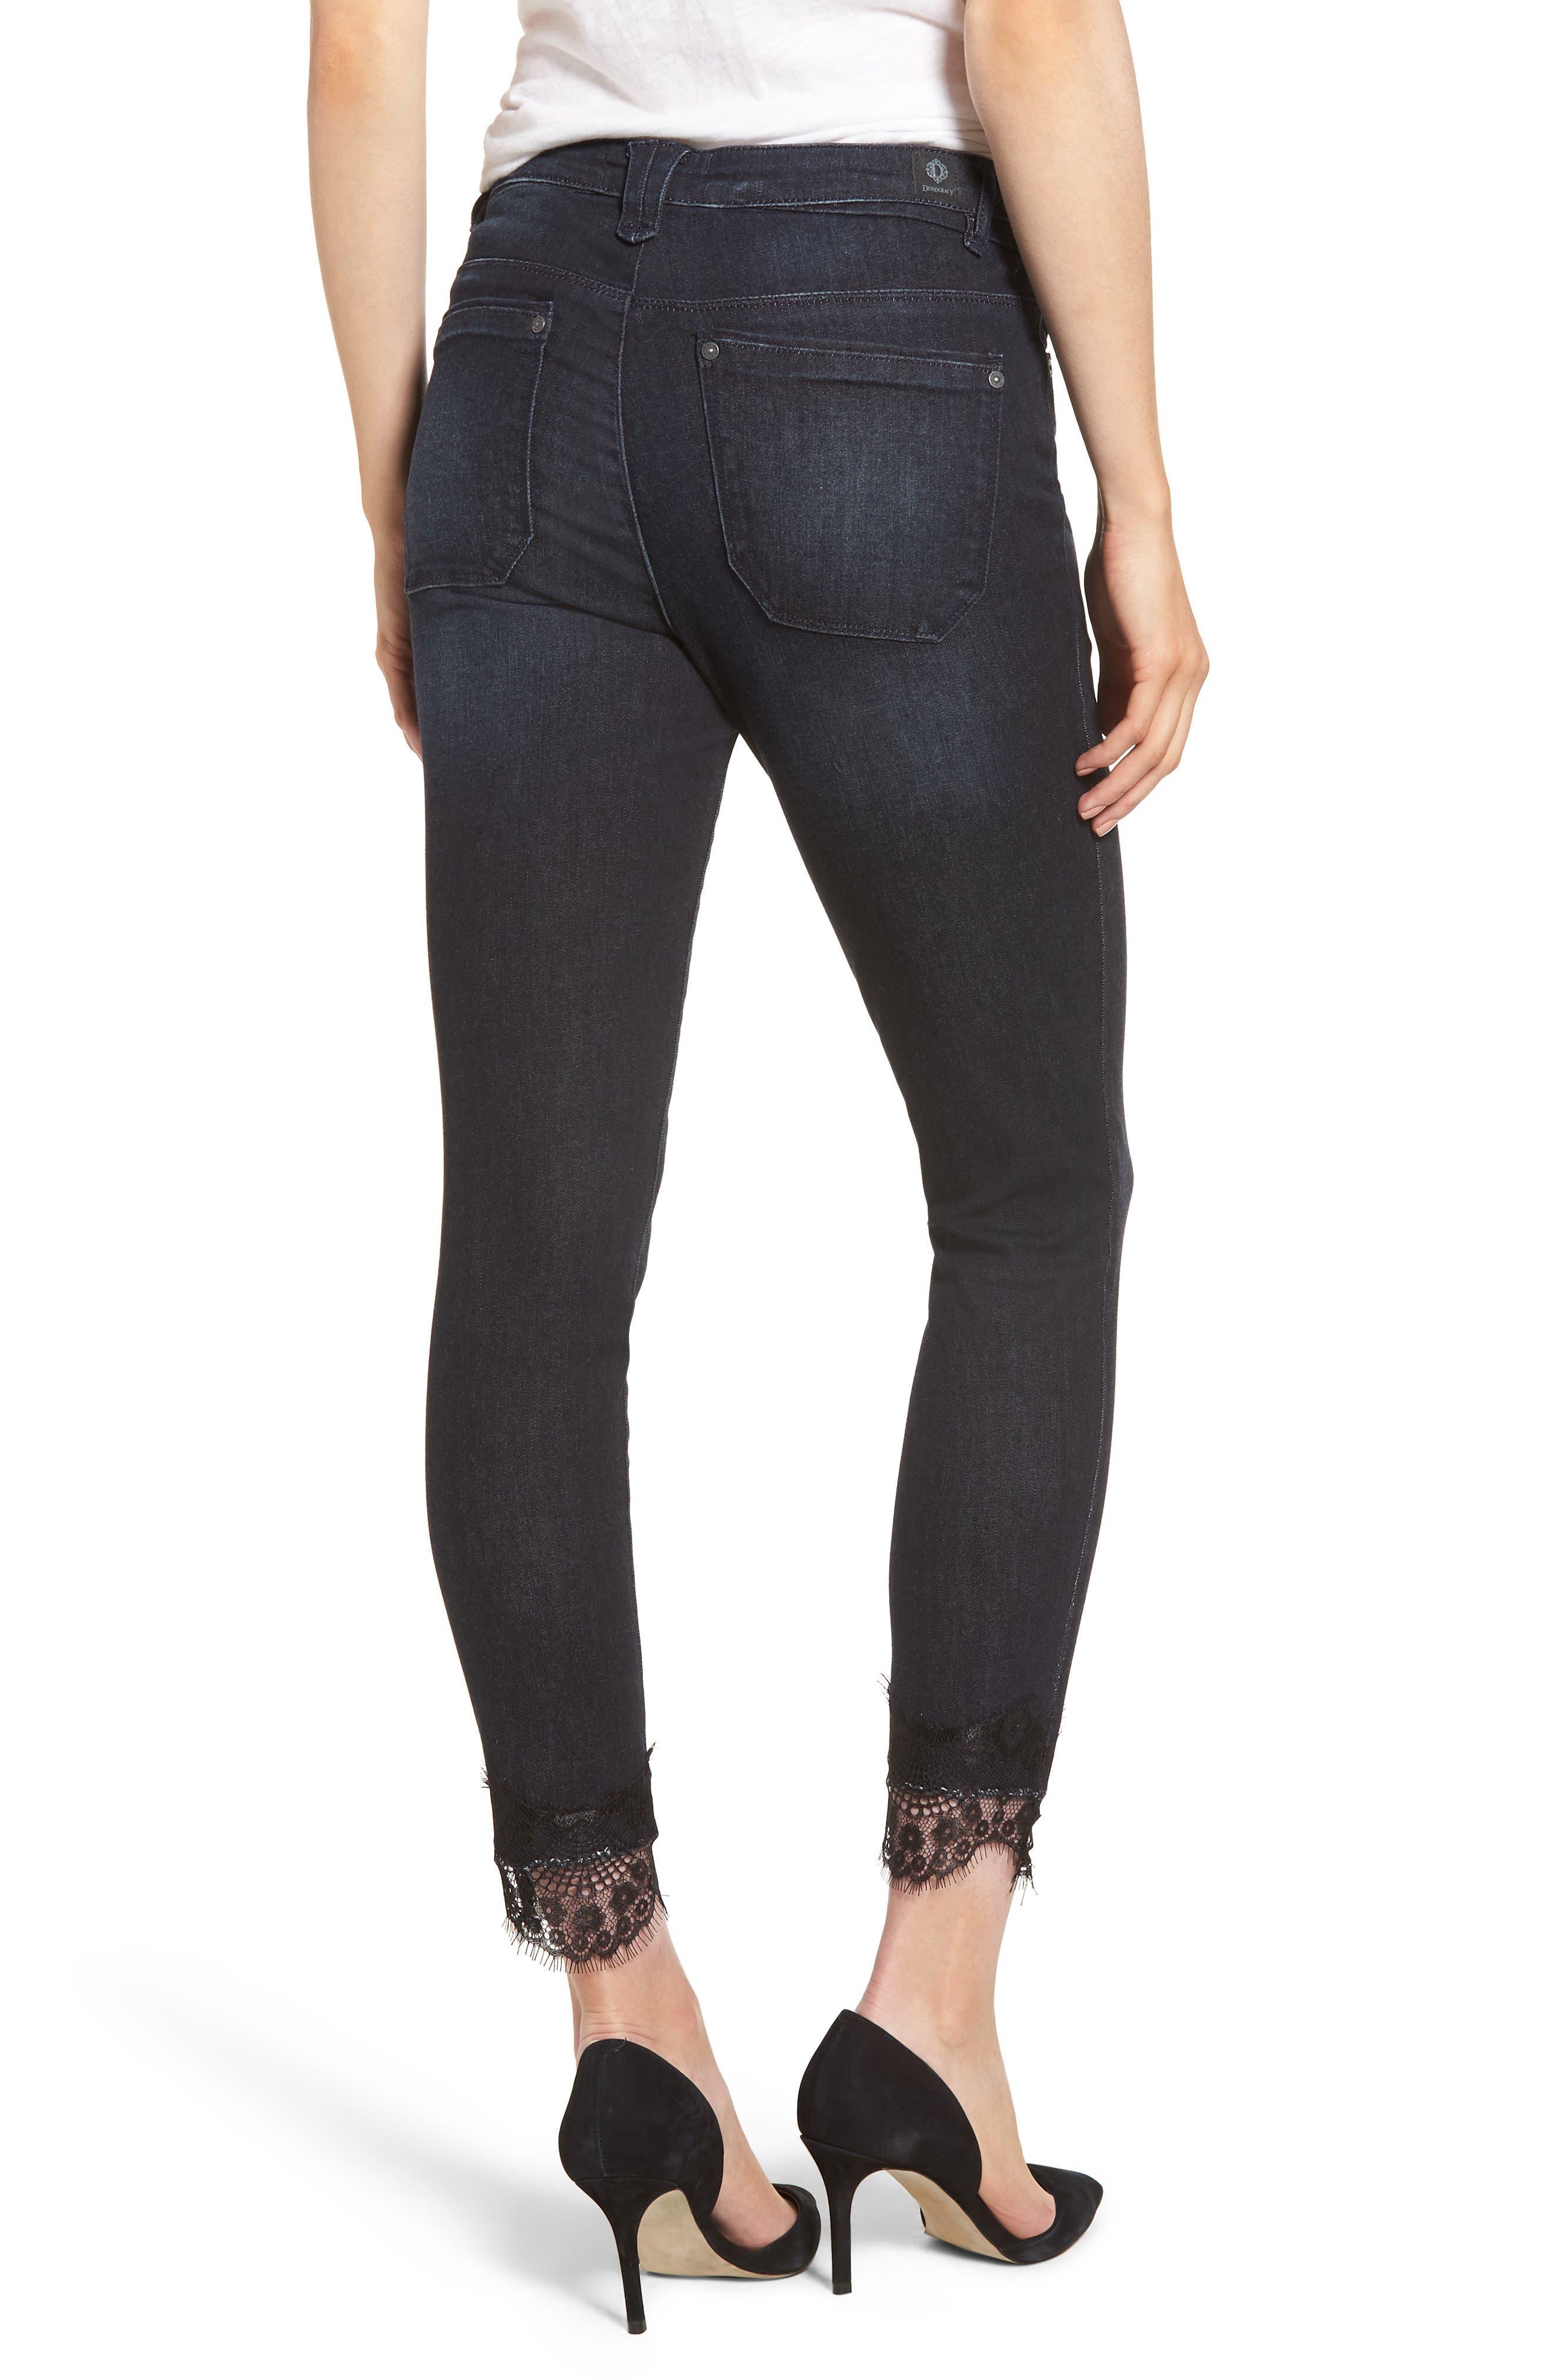 WIT & WISDOM,                             High Waist Eyelash Lace Ankle Skimmer Jeans,                             Alternate thumbnail 2, color,                             402